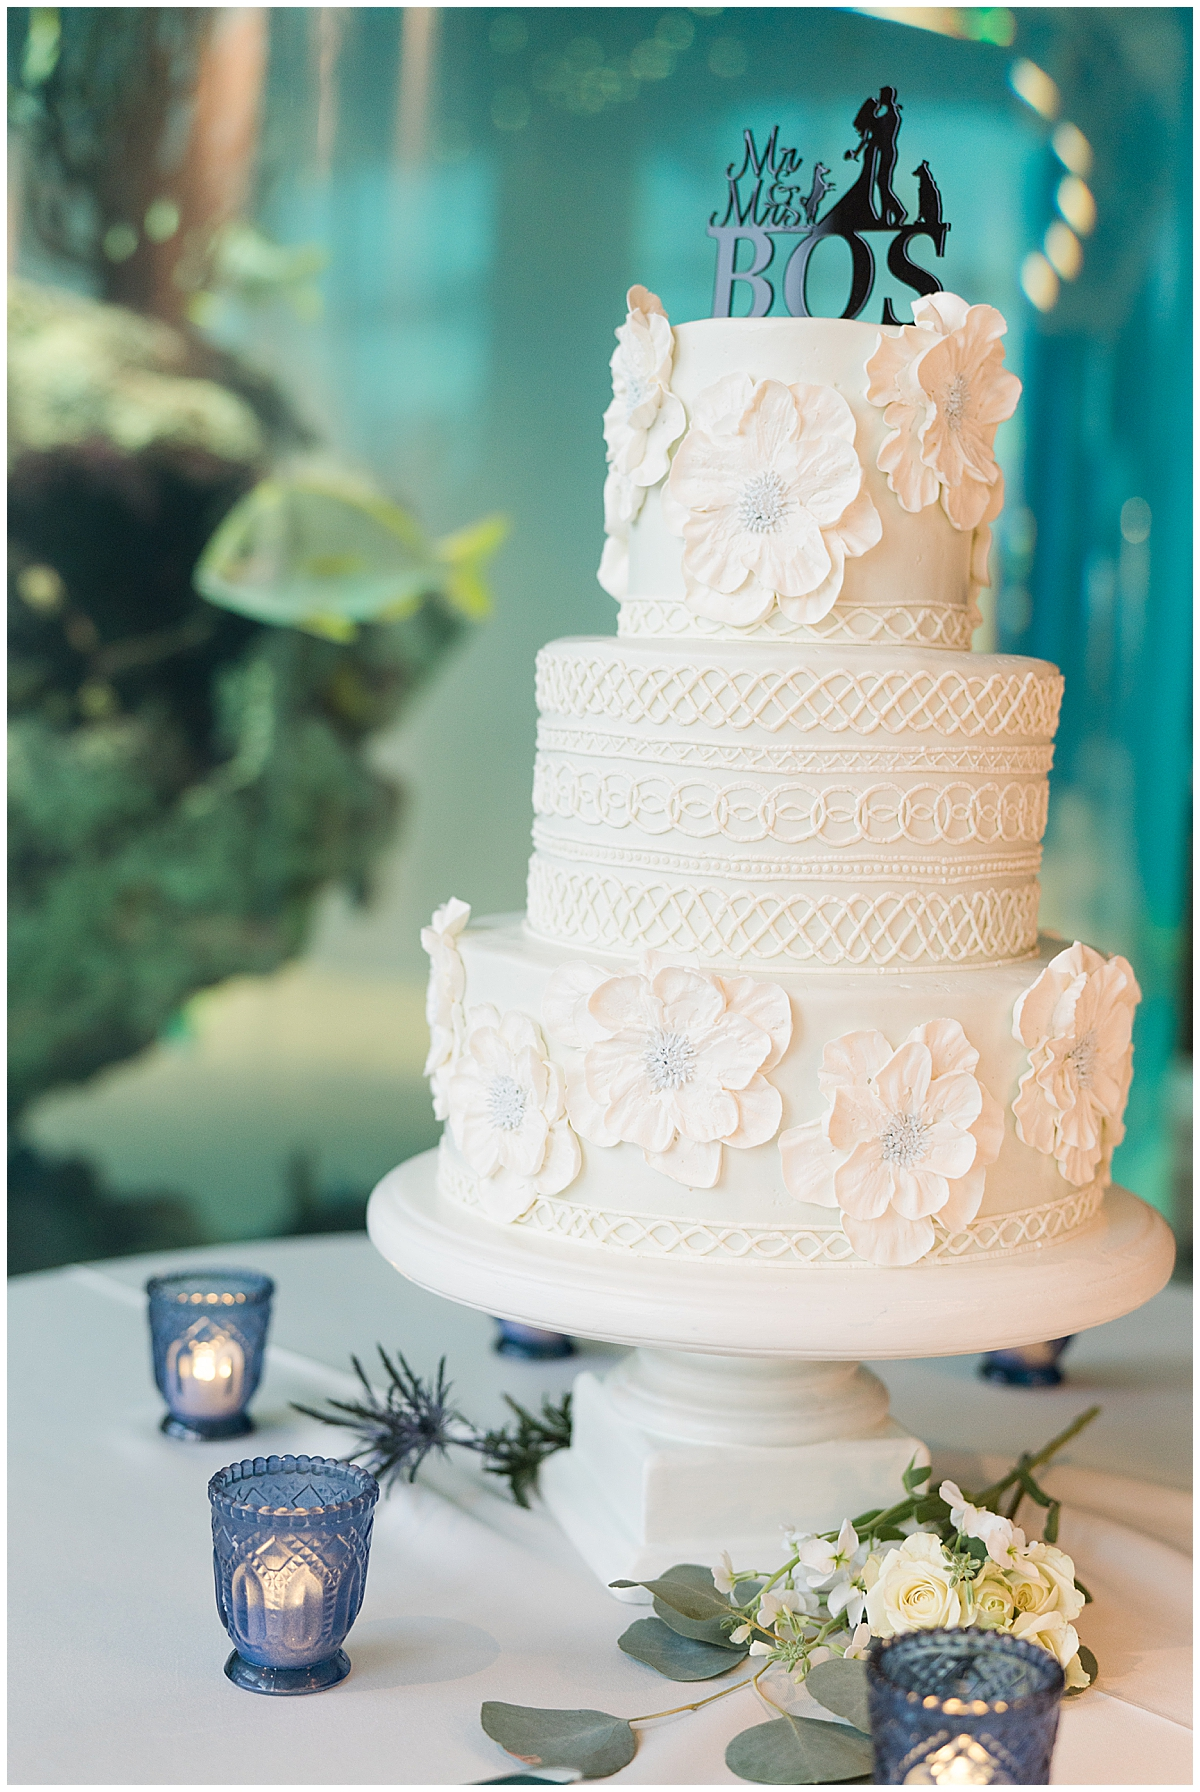 tiered wedding cake by jellyfish display at Charleston Aquarium